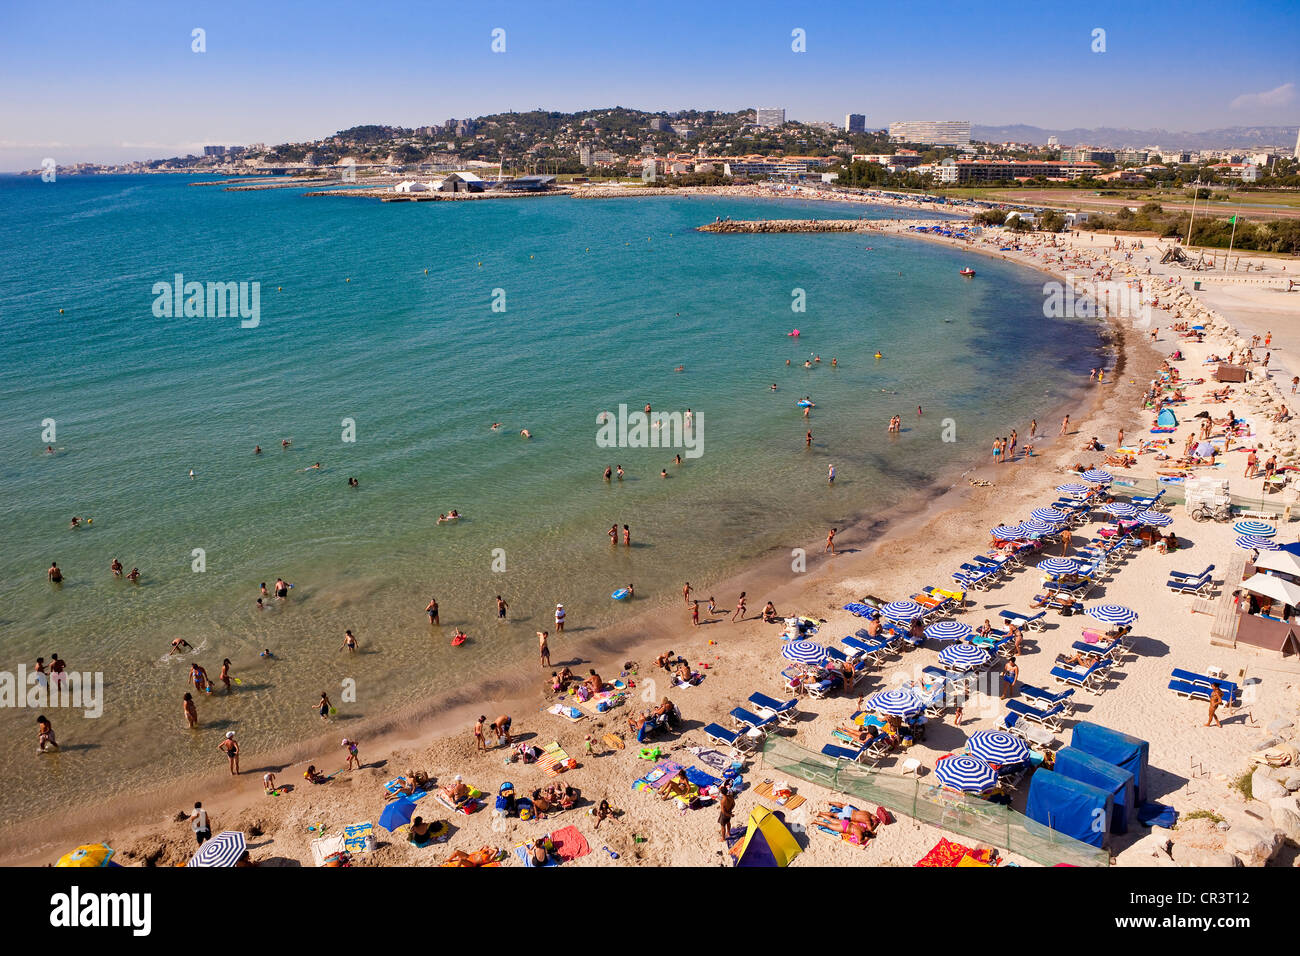 Prado Beach Marseille Stock Photos Prado Beach Marseille Stock